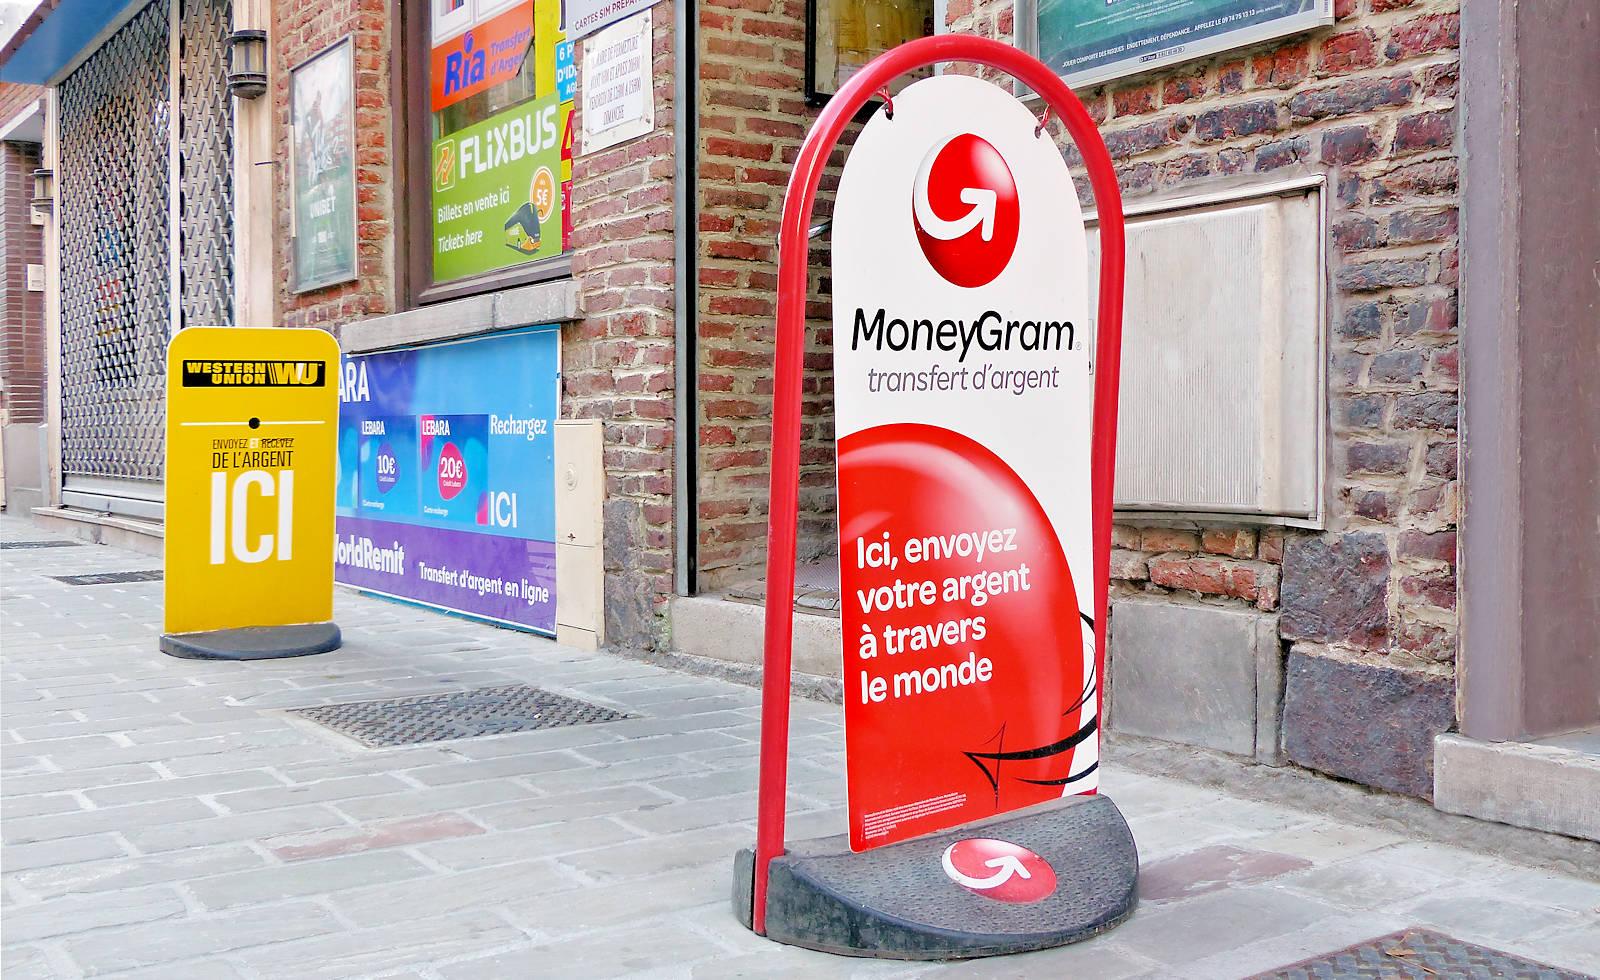 Wordcom Tourcoing - MoneyGram Western Union